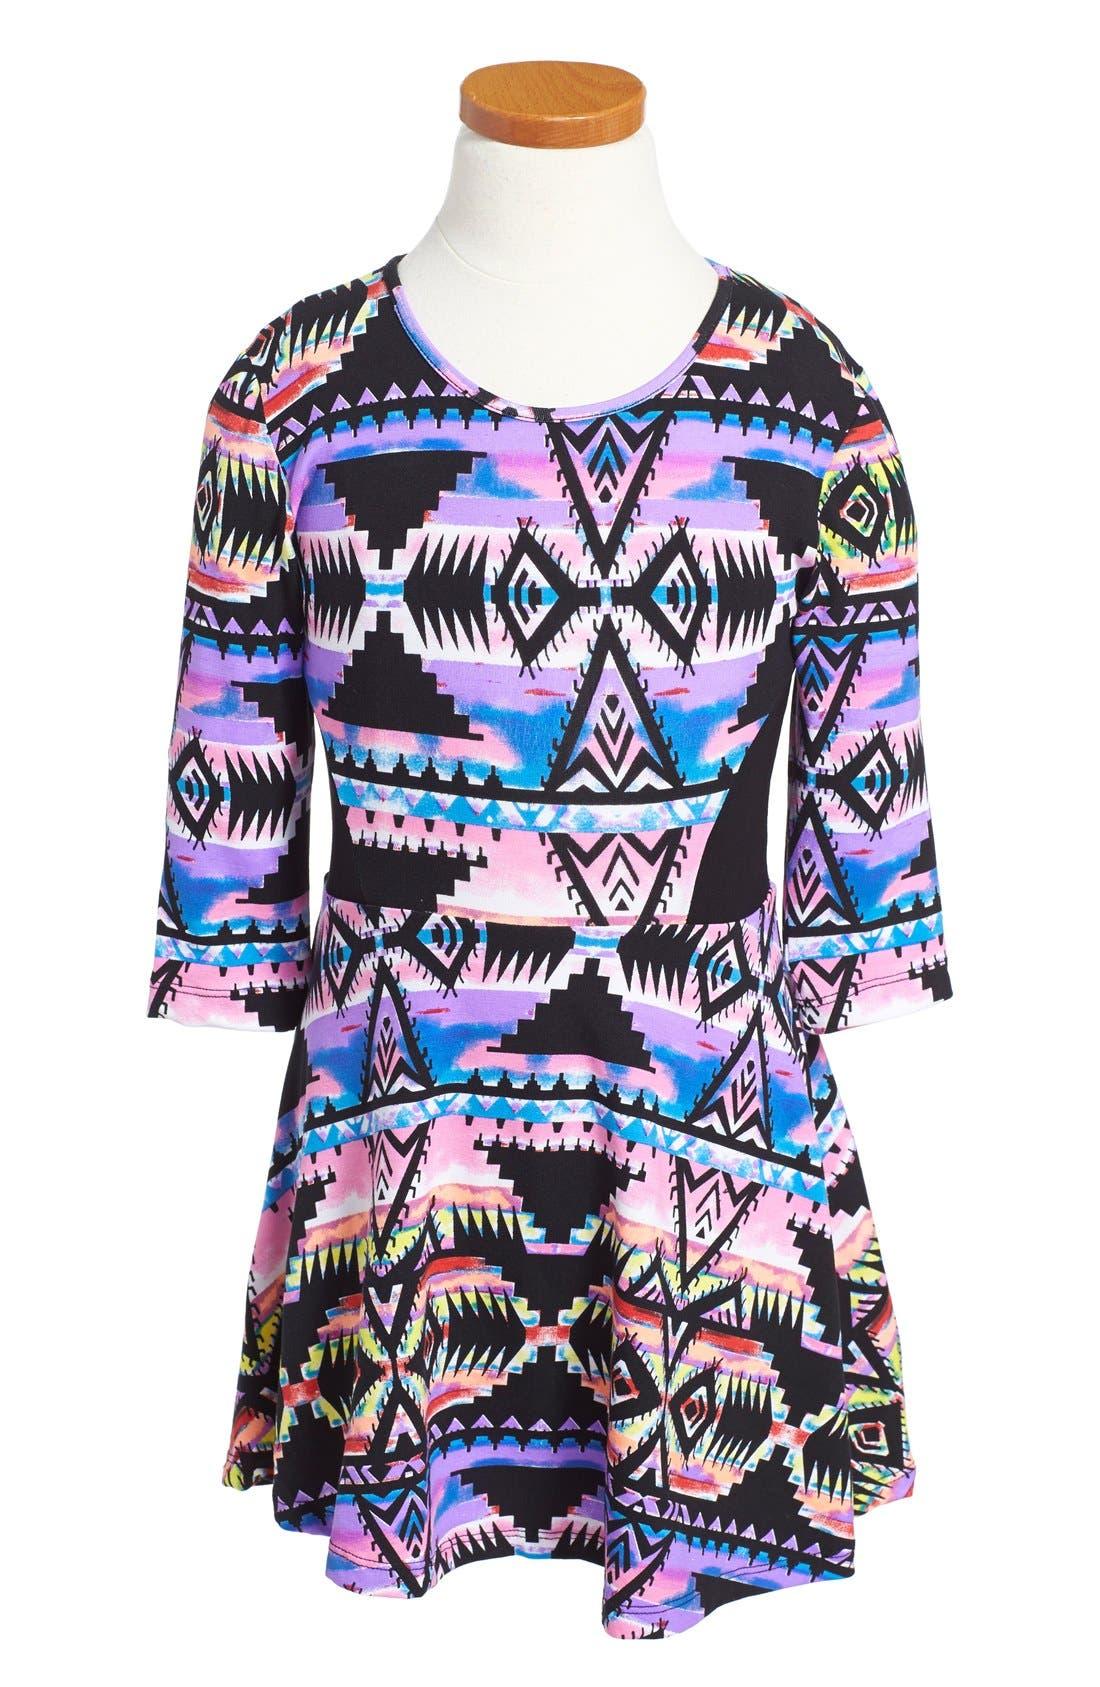 Pendleton Womens June Dress